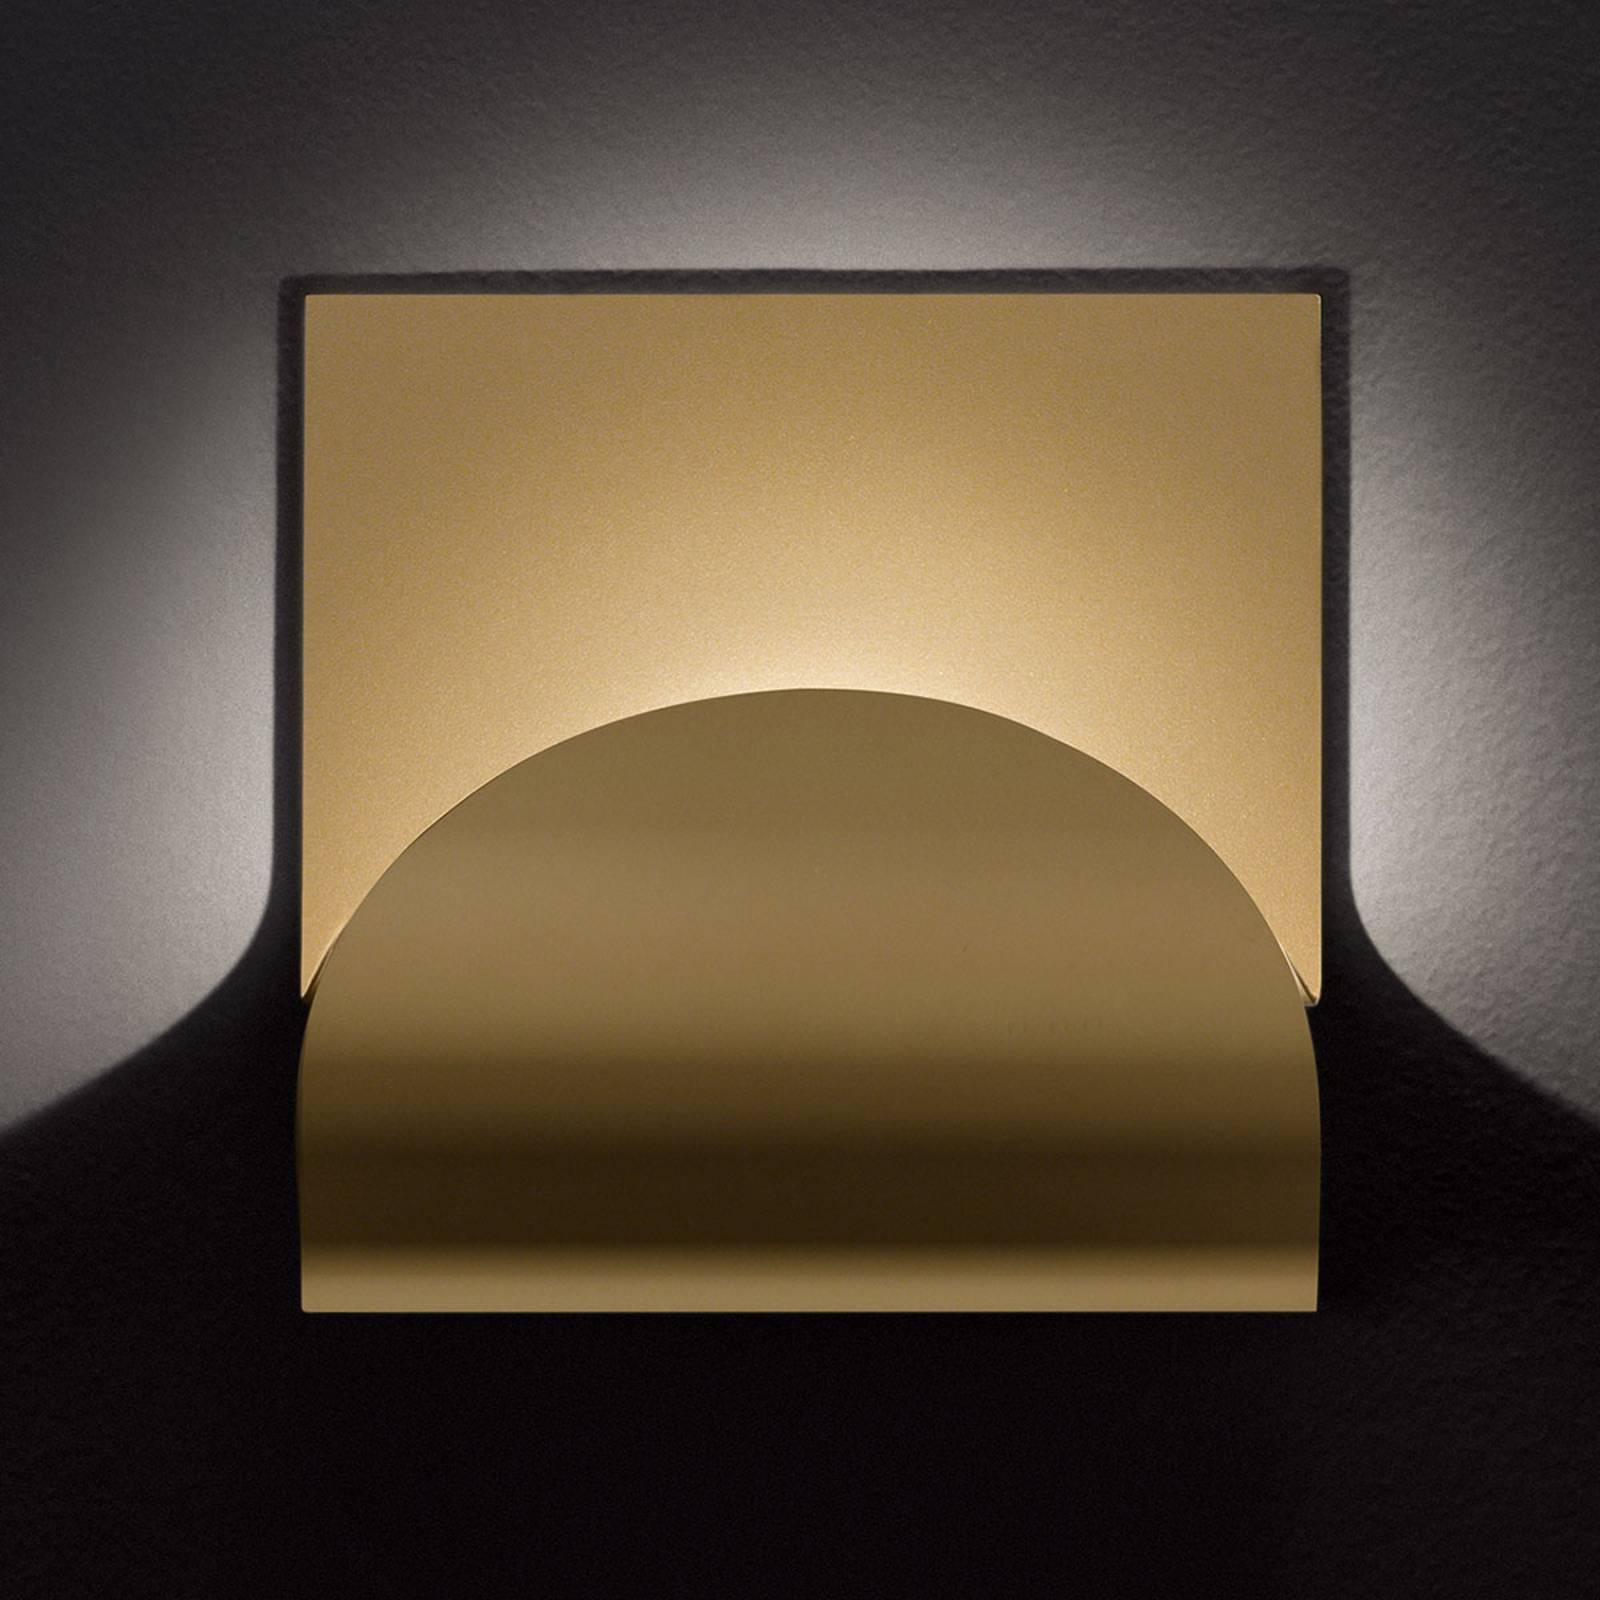 Cini&Nils Incontro LED-Wandleuchte matt gold